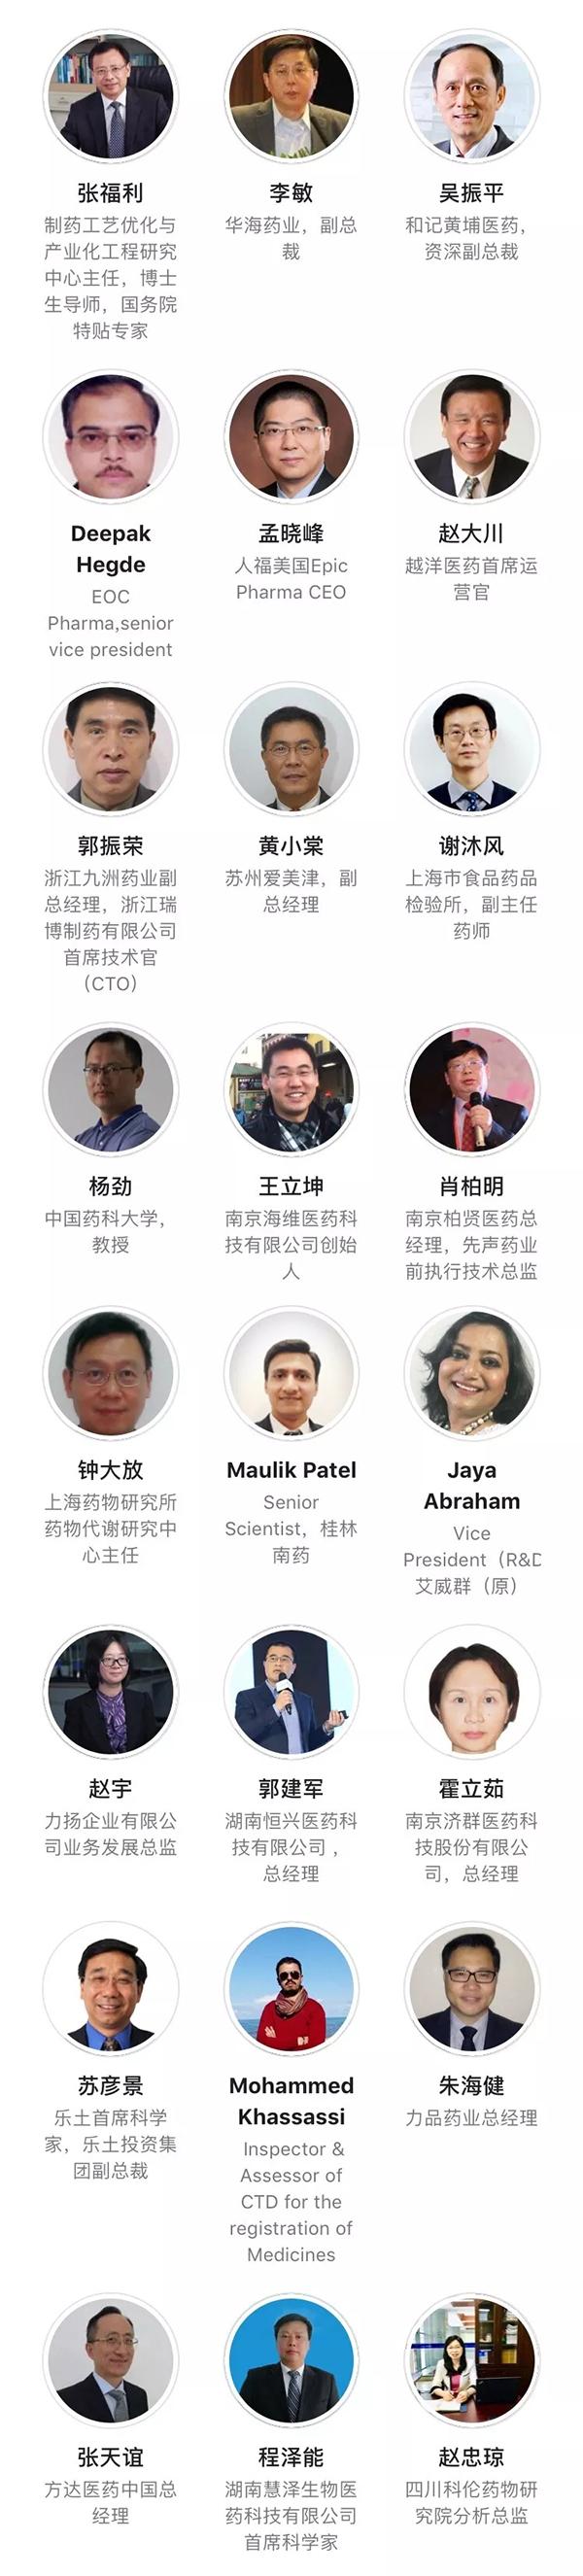 GAP 2019 求实化学药开发论坛2